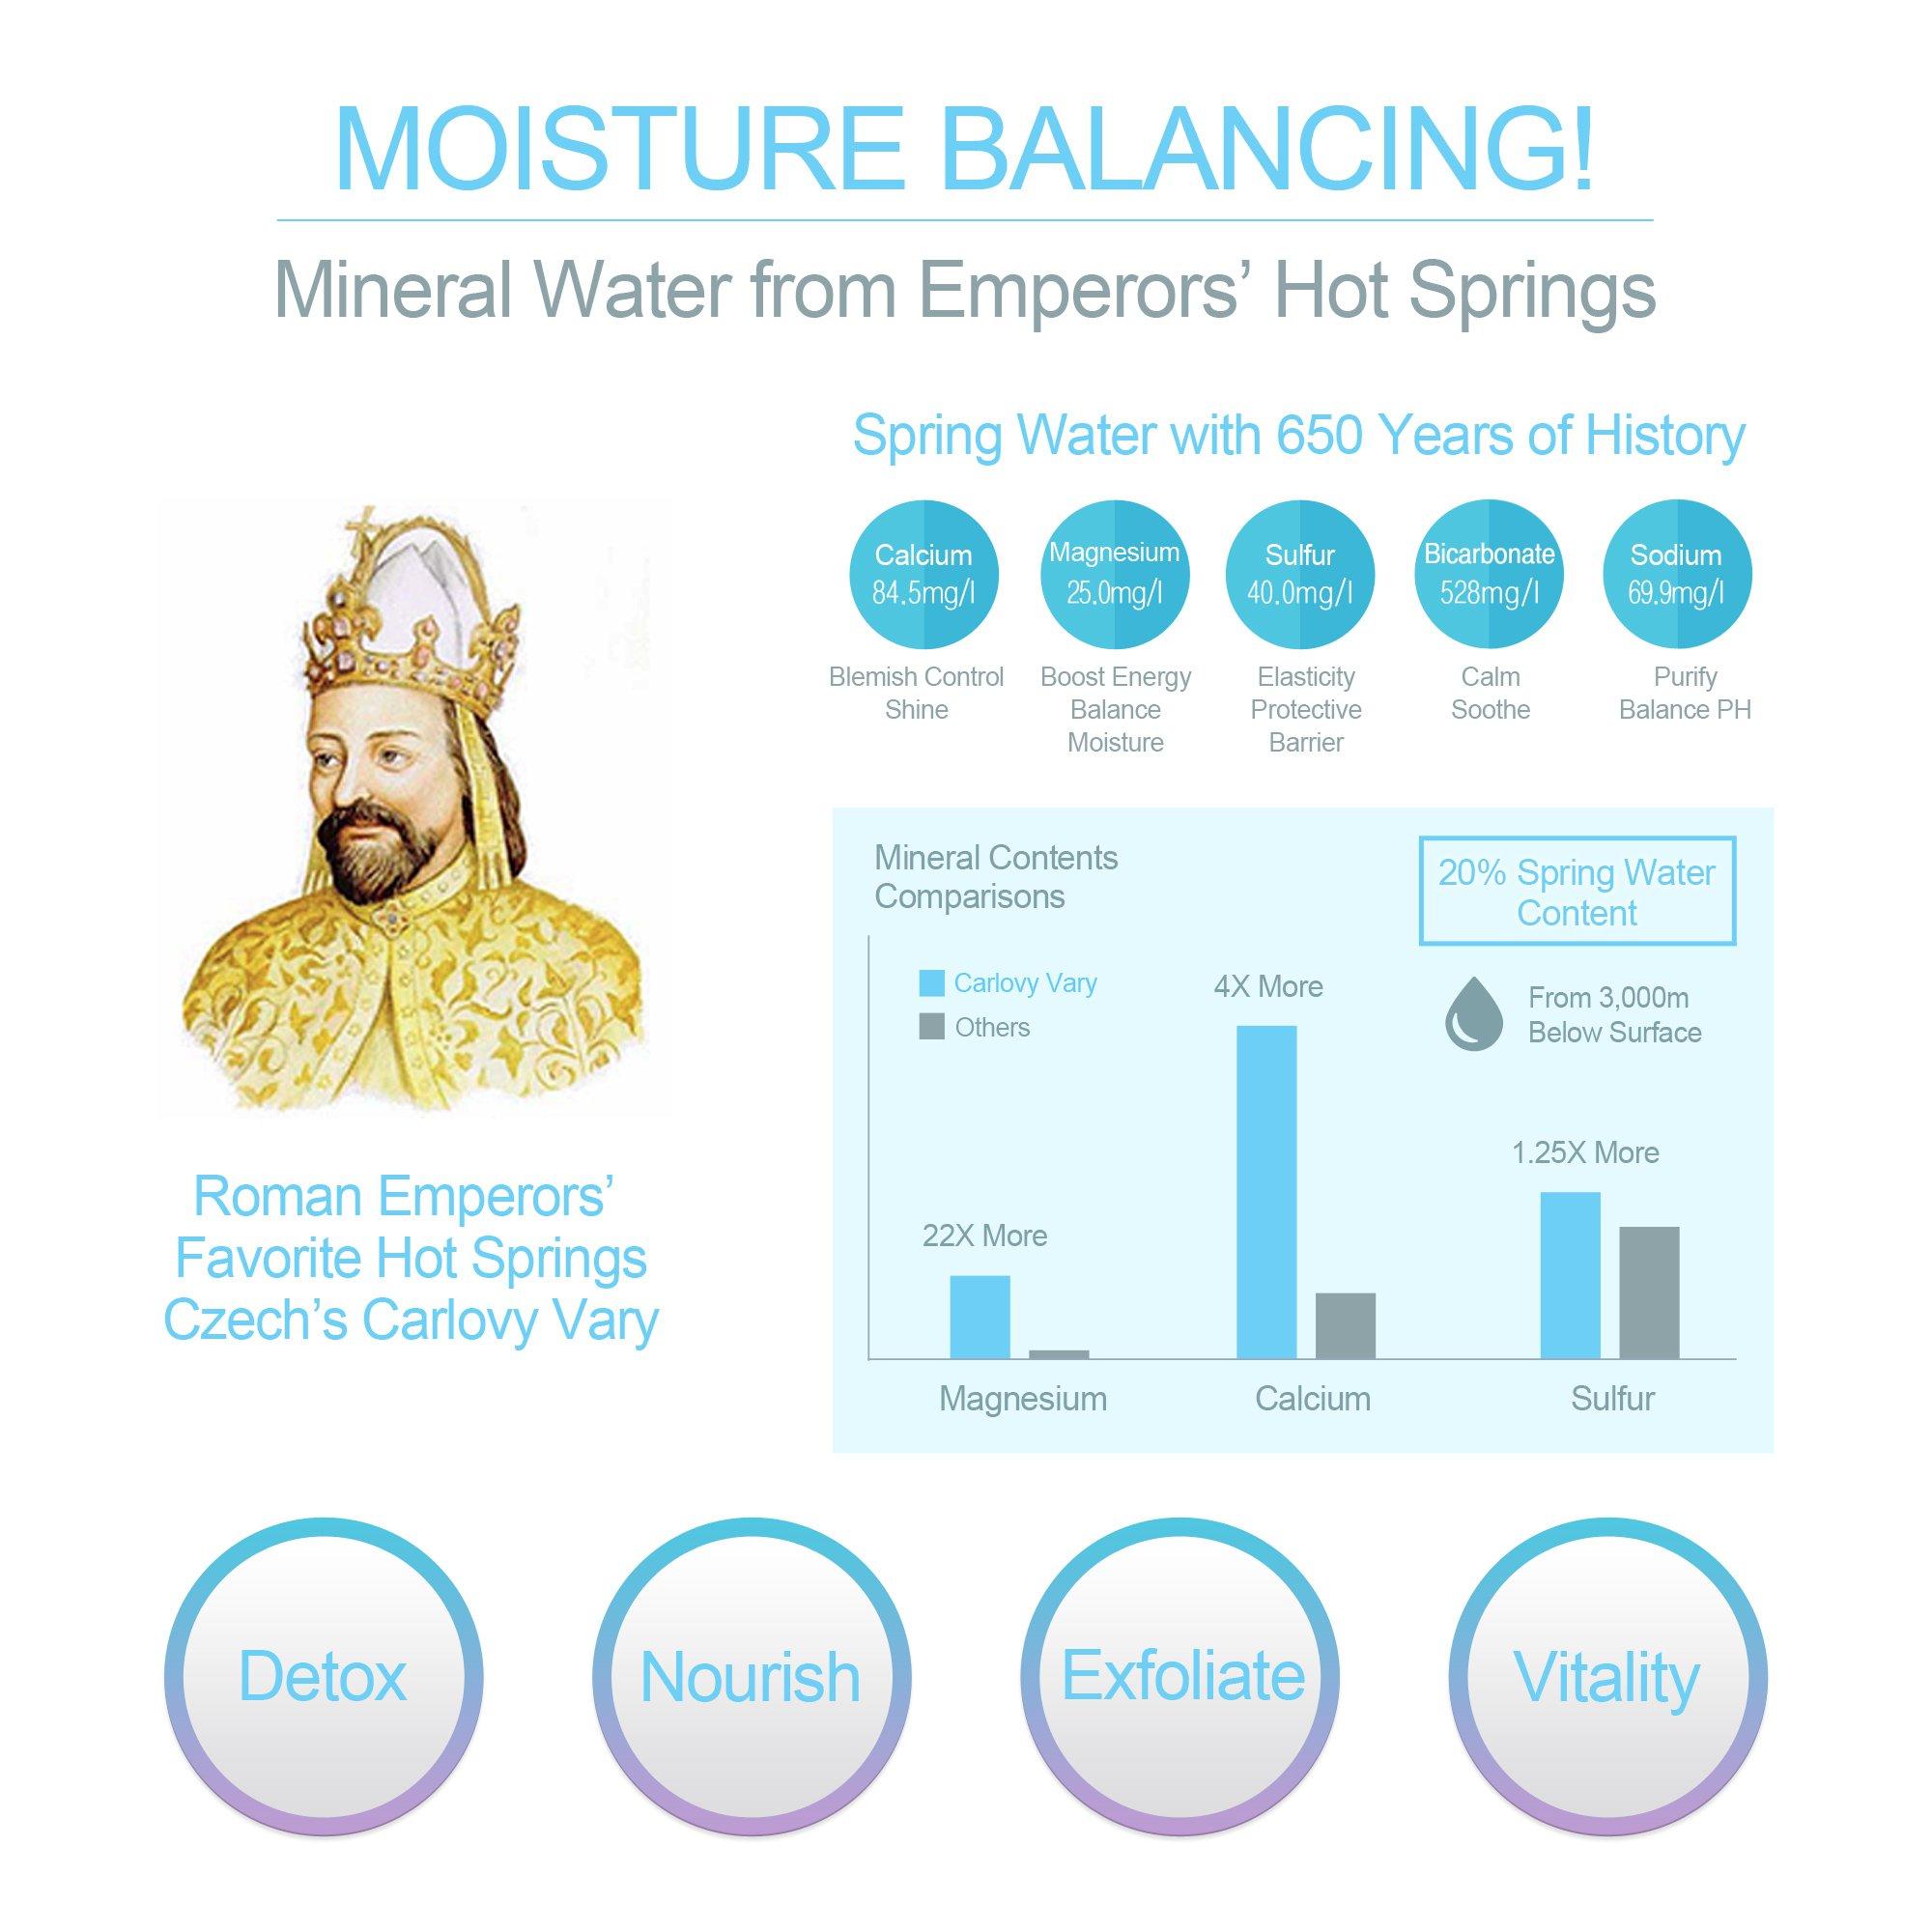 Ariul Aqua Blast Hydrating Cream 1.69 fl. oz. Natural Moisturizing Cream to Balance Skin Temperature, Sodium Hyaluronate, Betaine, Niacinamide, Adenosine, Calm & Soothe